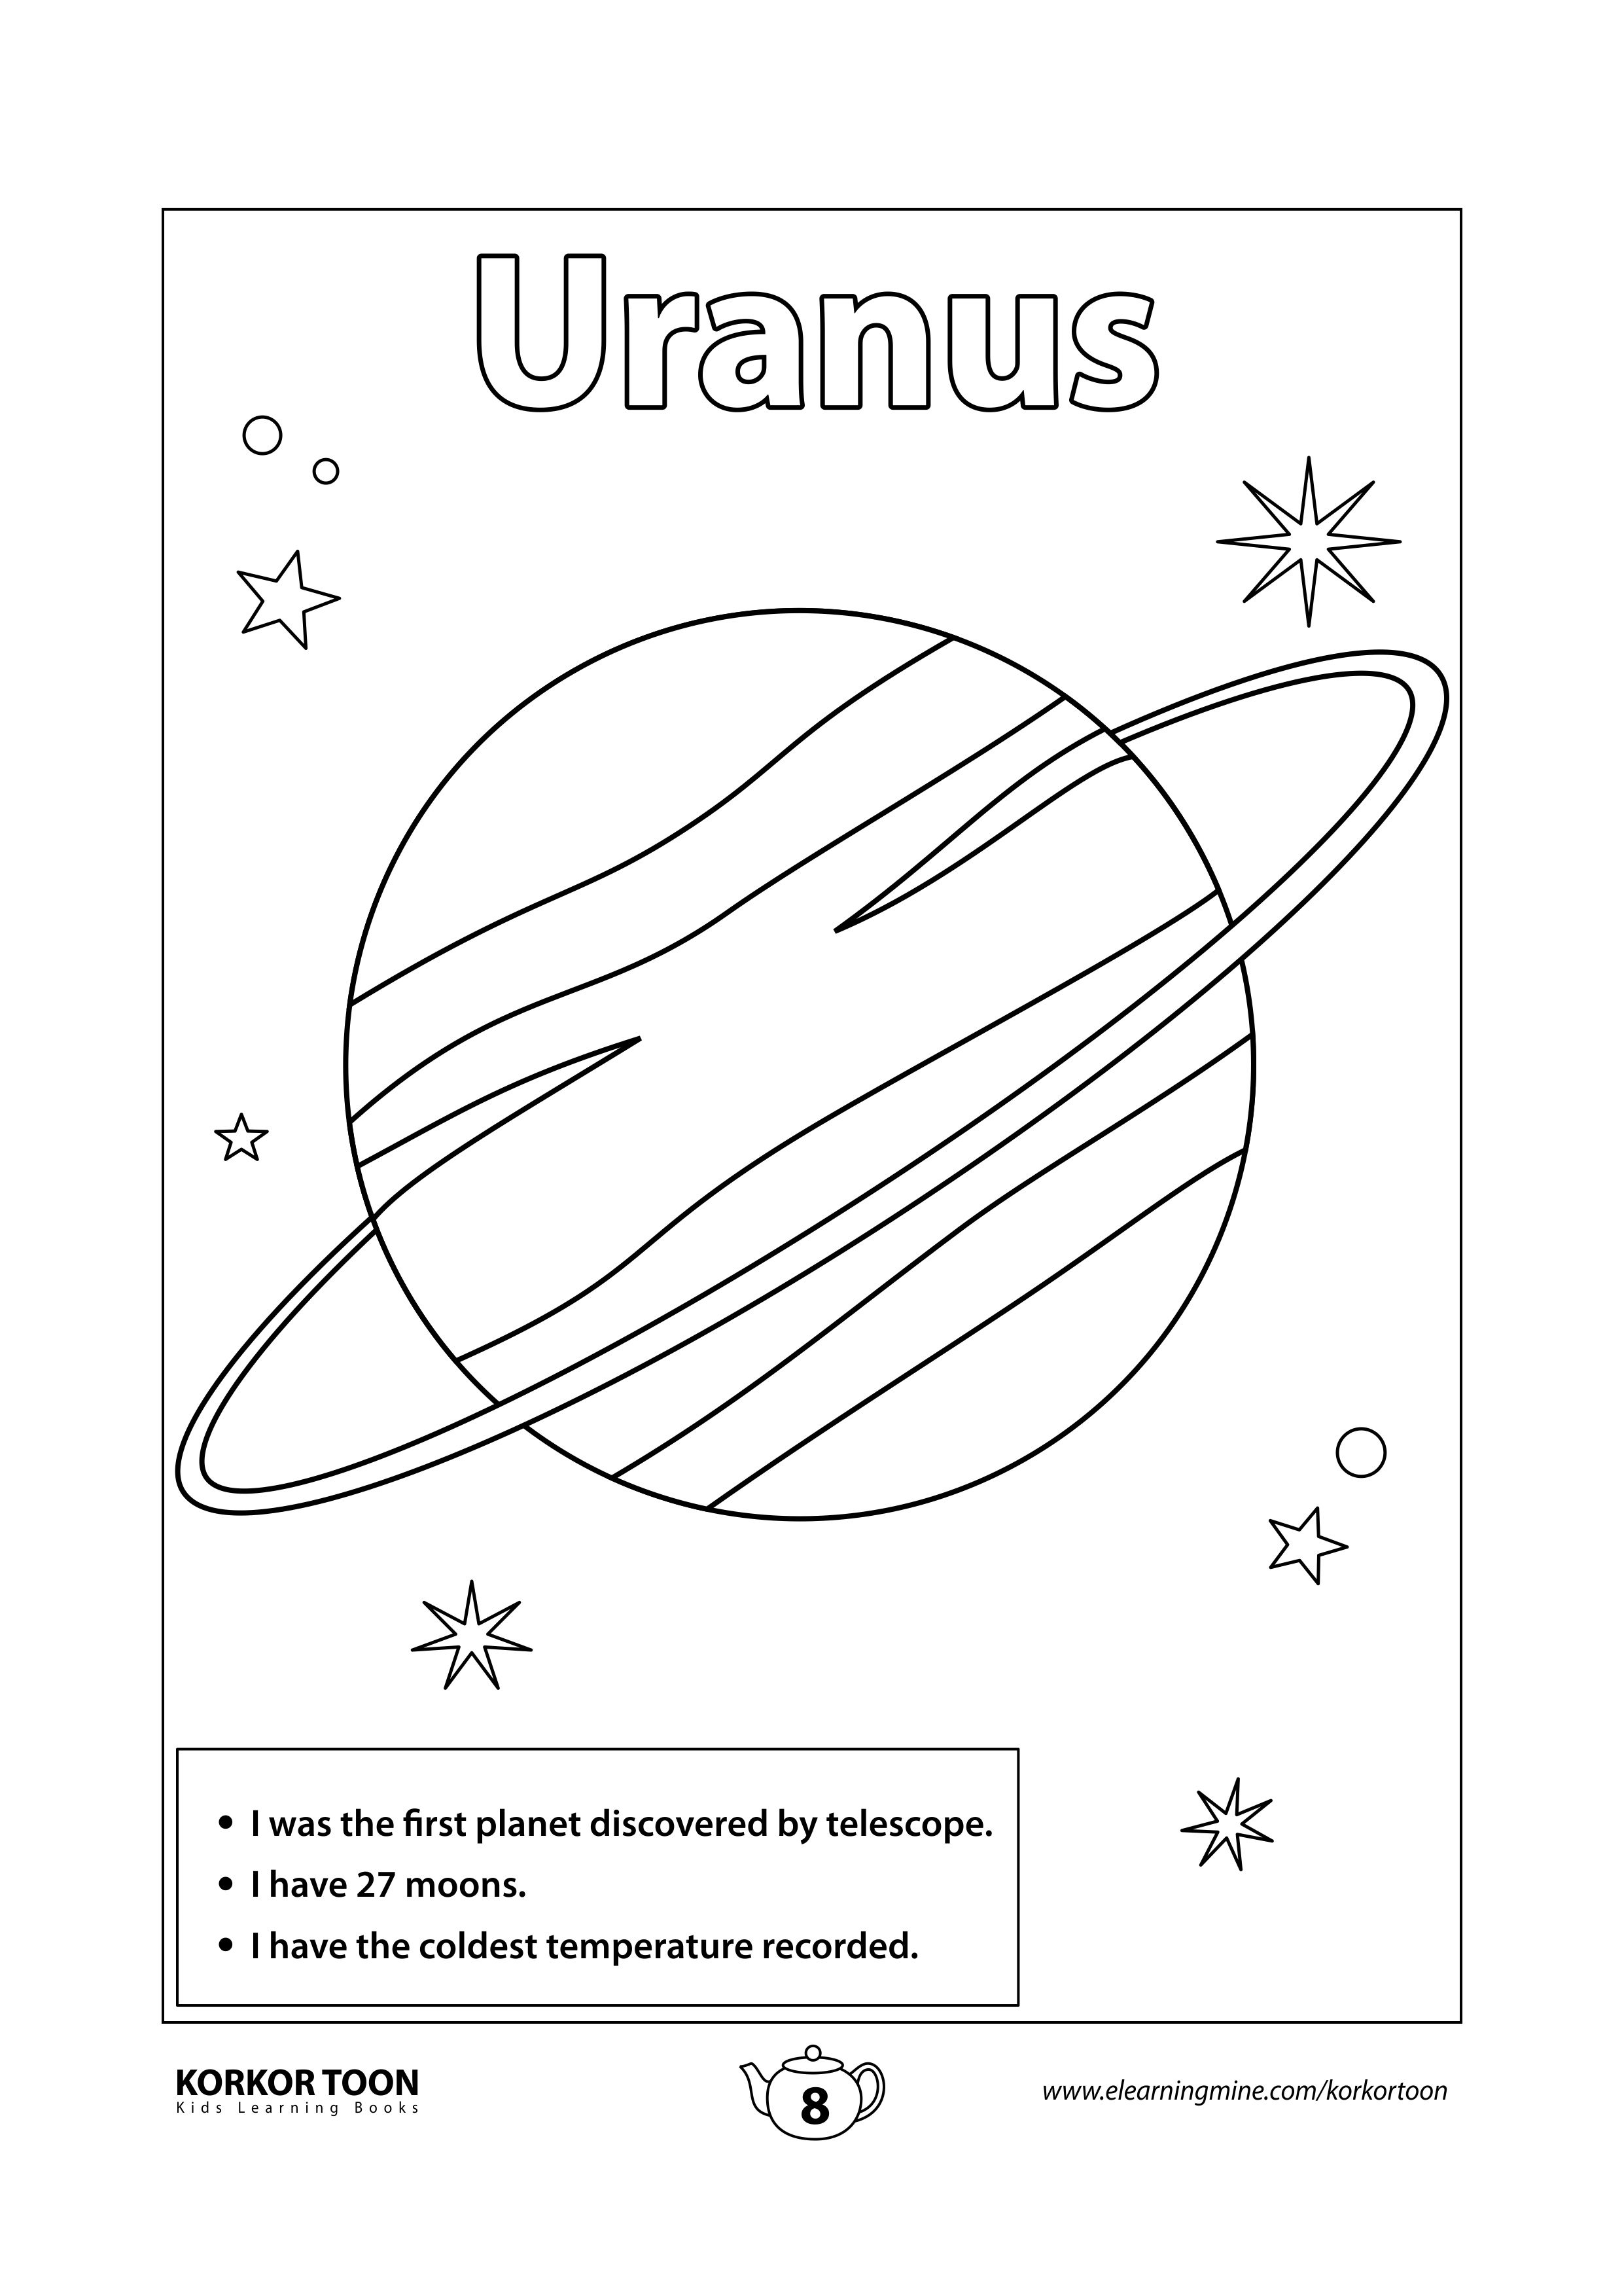 Solar System Coloring Book For Kids Uranus Page 8 Coloring Books Kids Coloring Books Printables Free Kids [ 3508 x 2482 Pixel ]